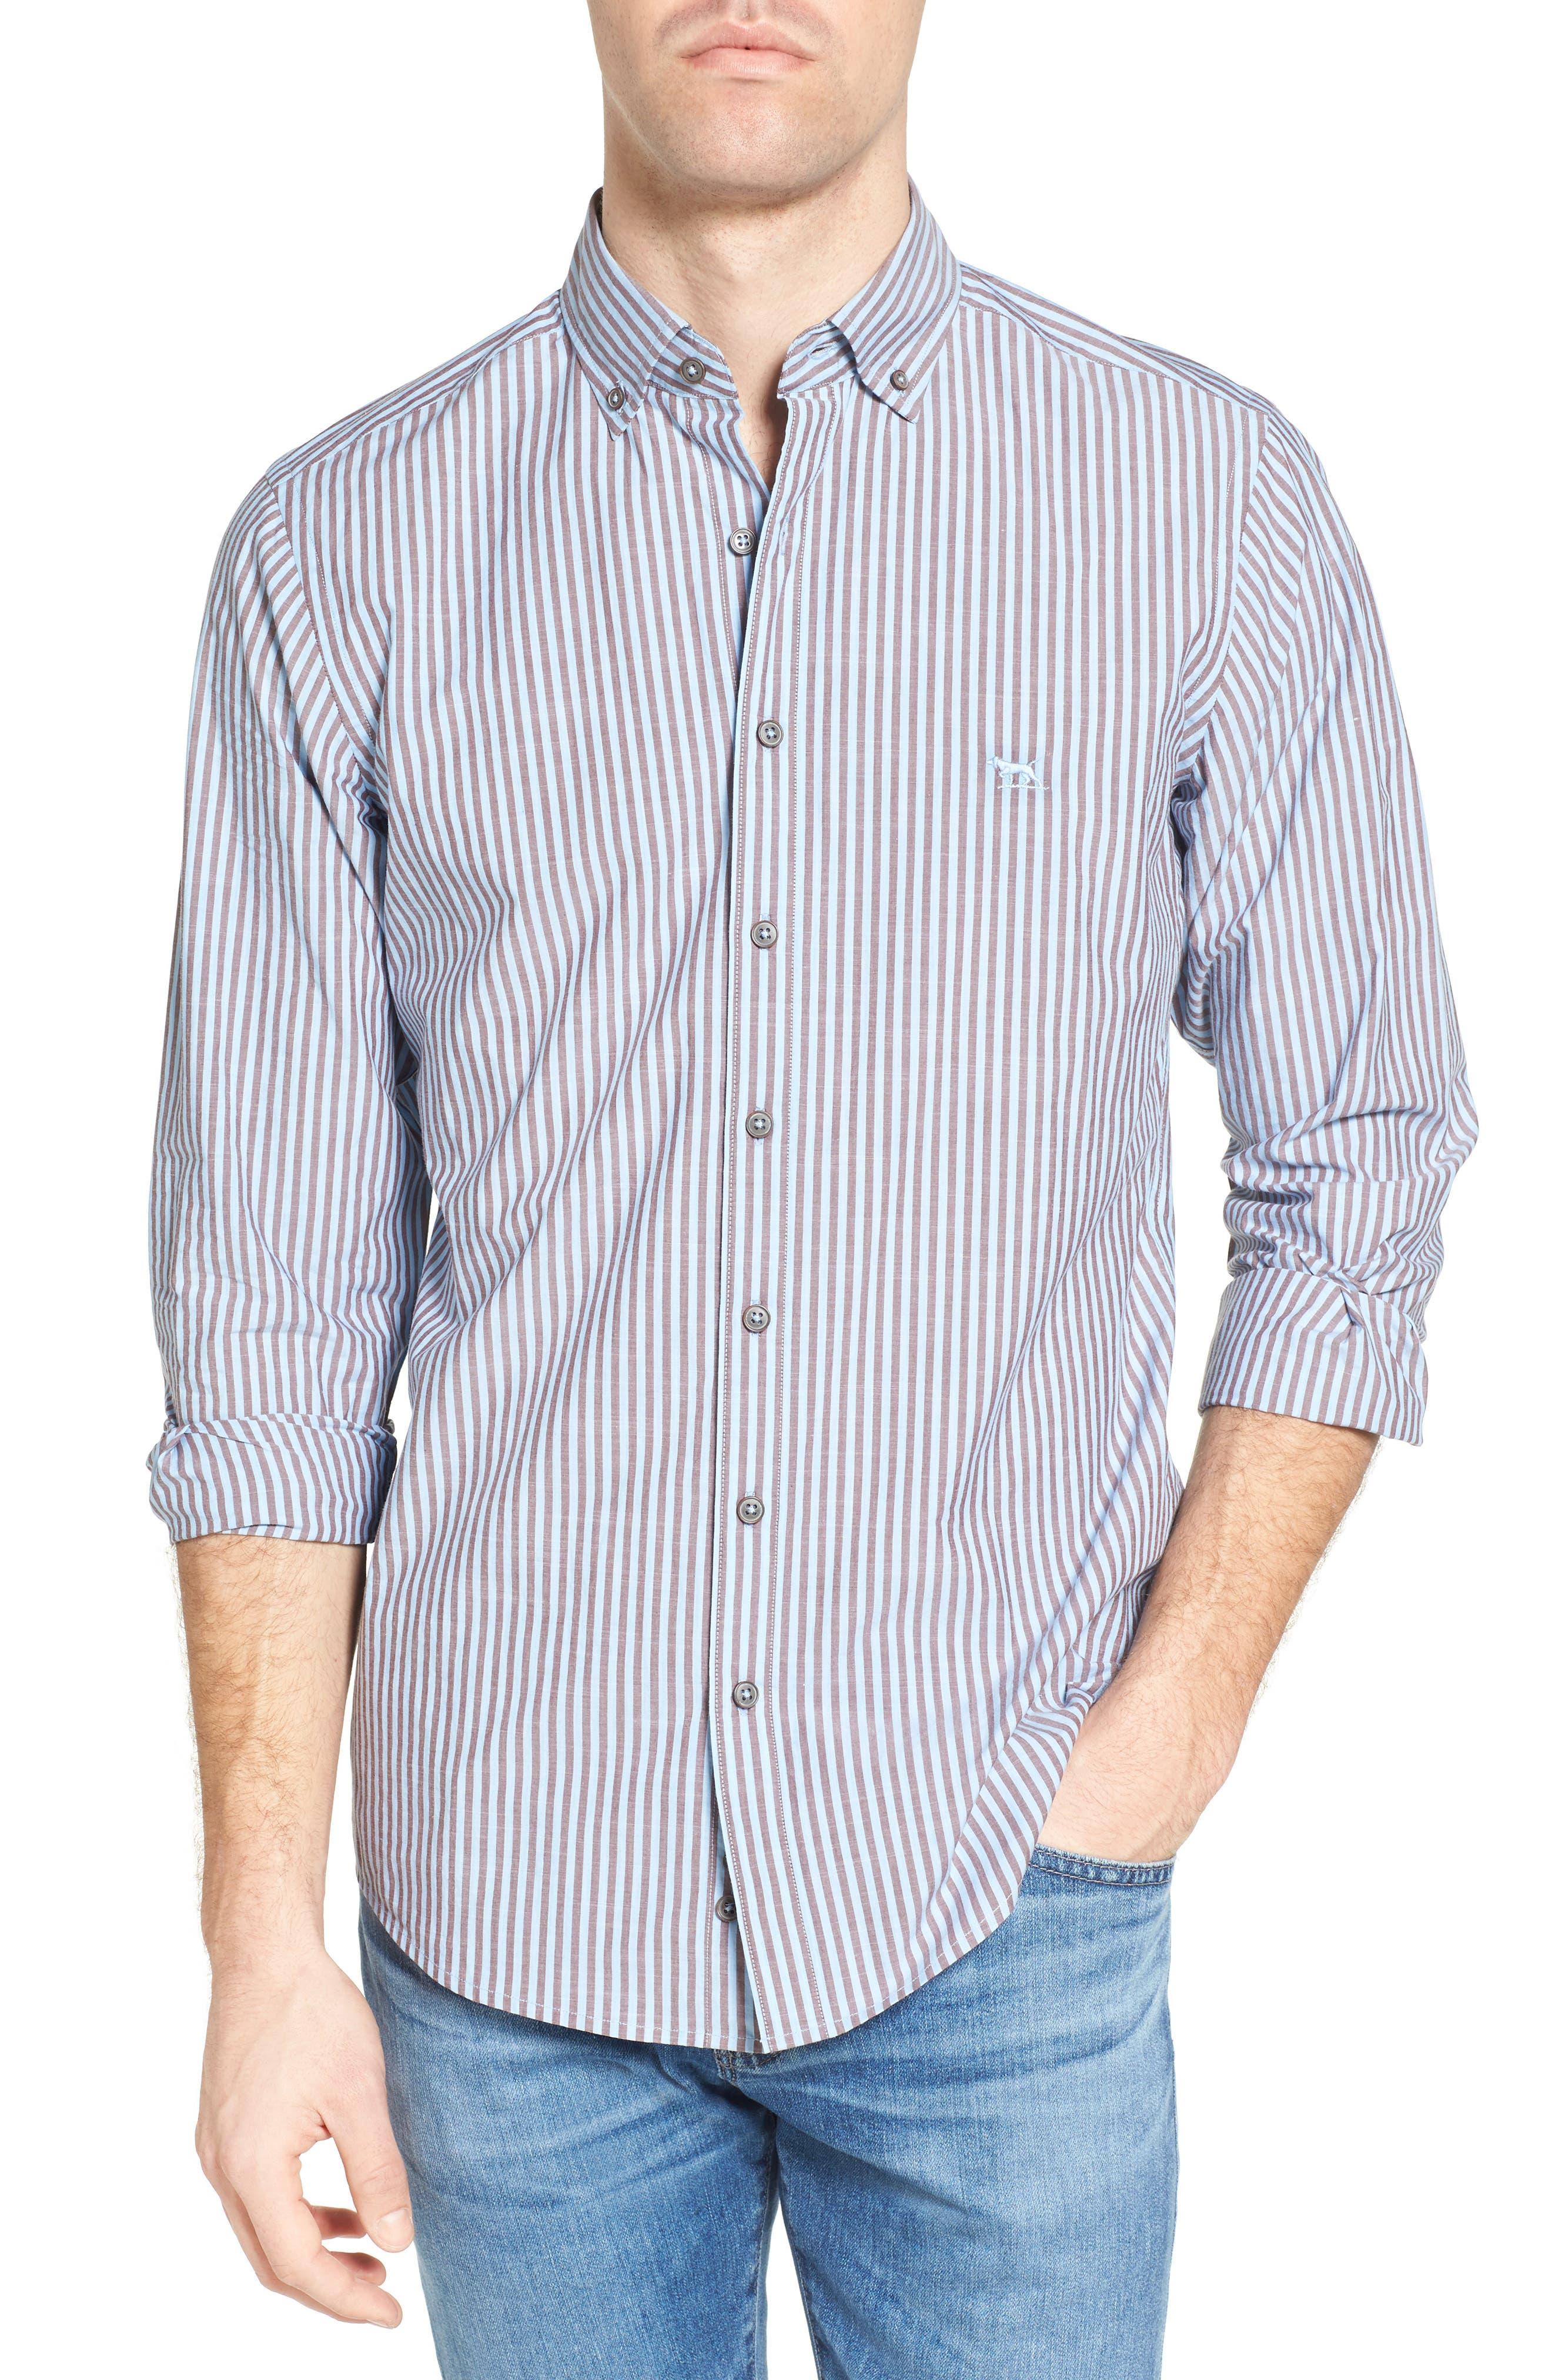 Main Image - Rodd & Gunn Fitzroy Stripe Sport Shirt